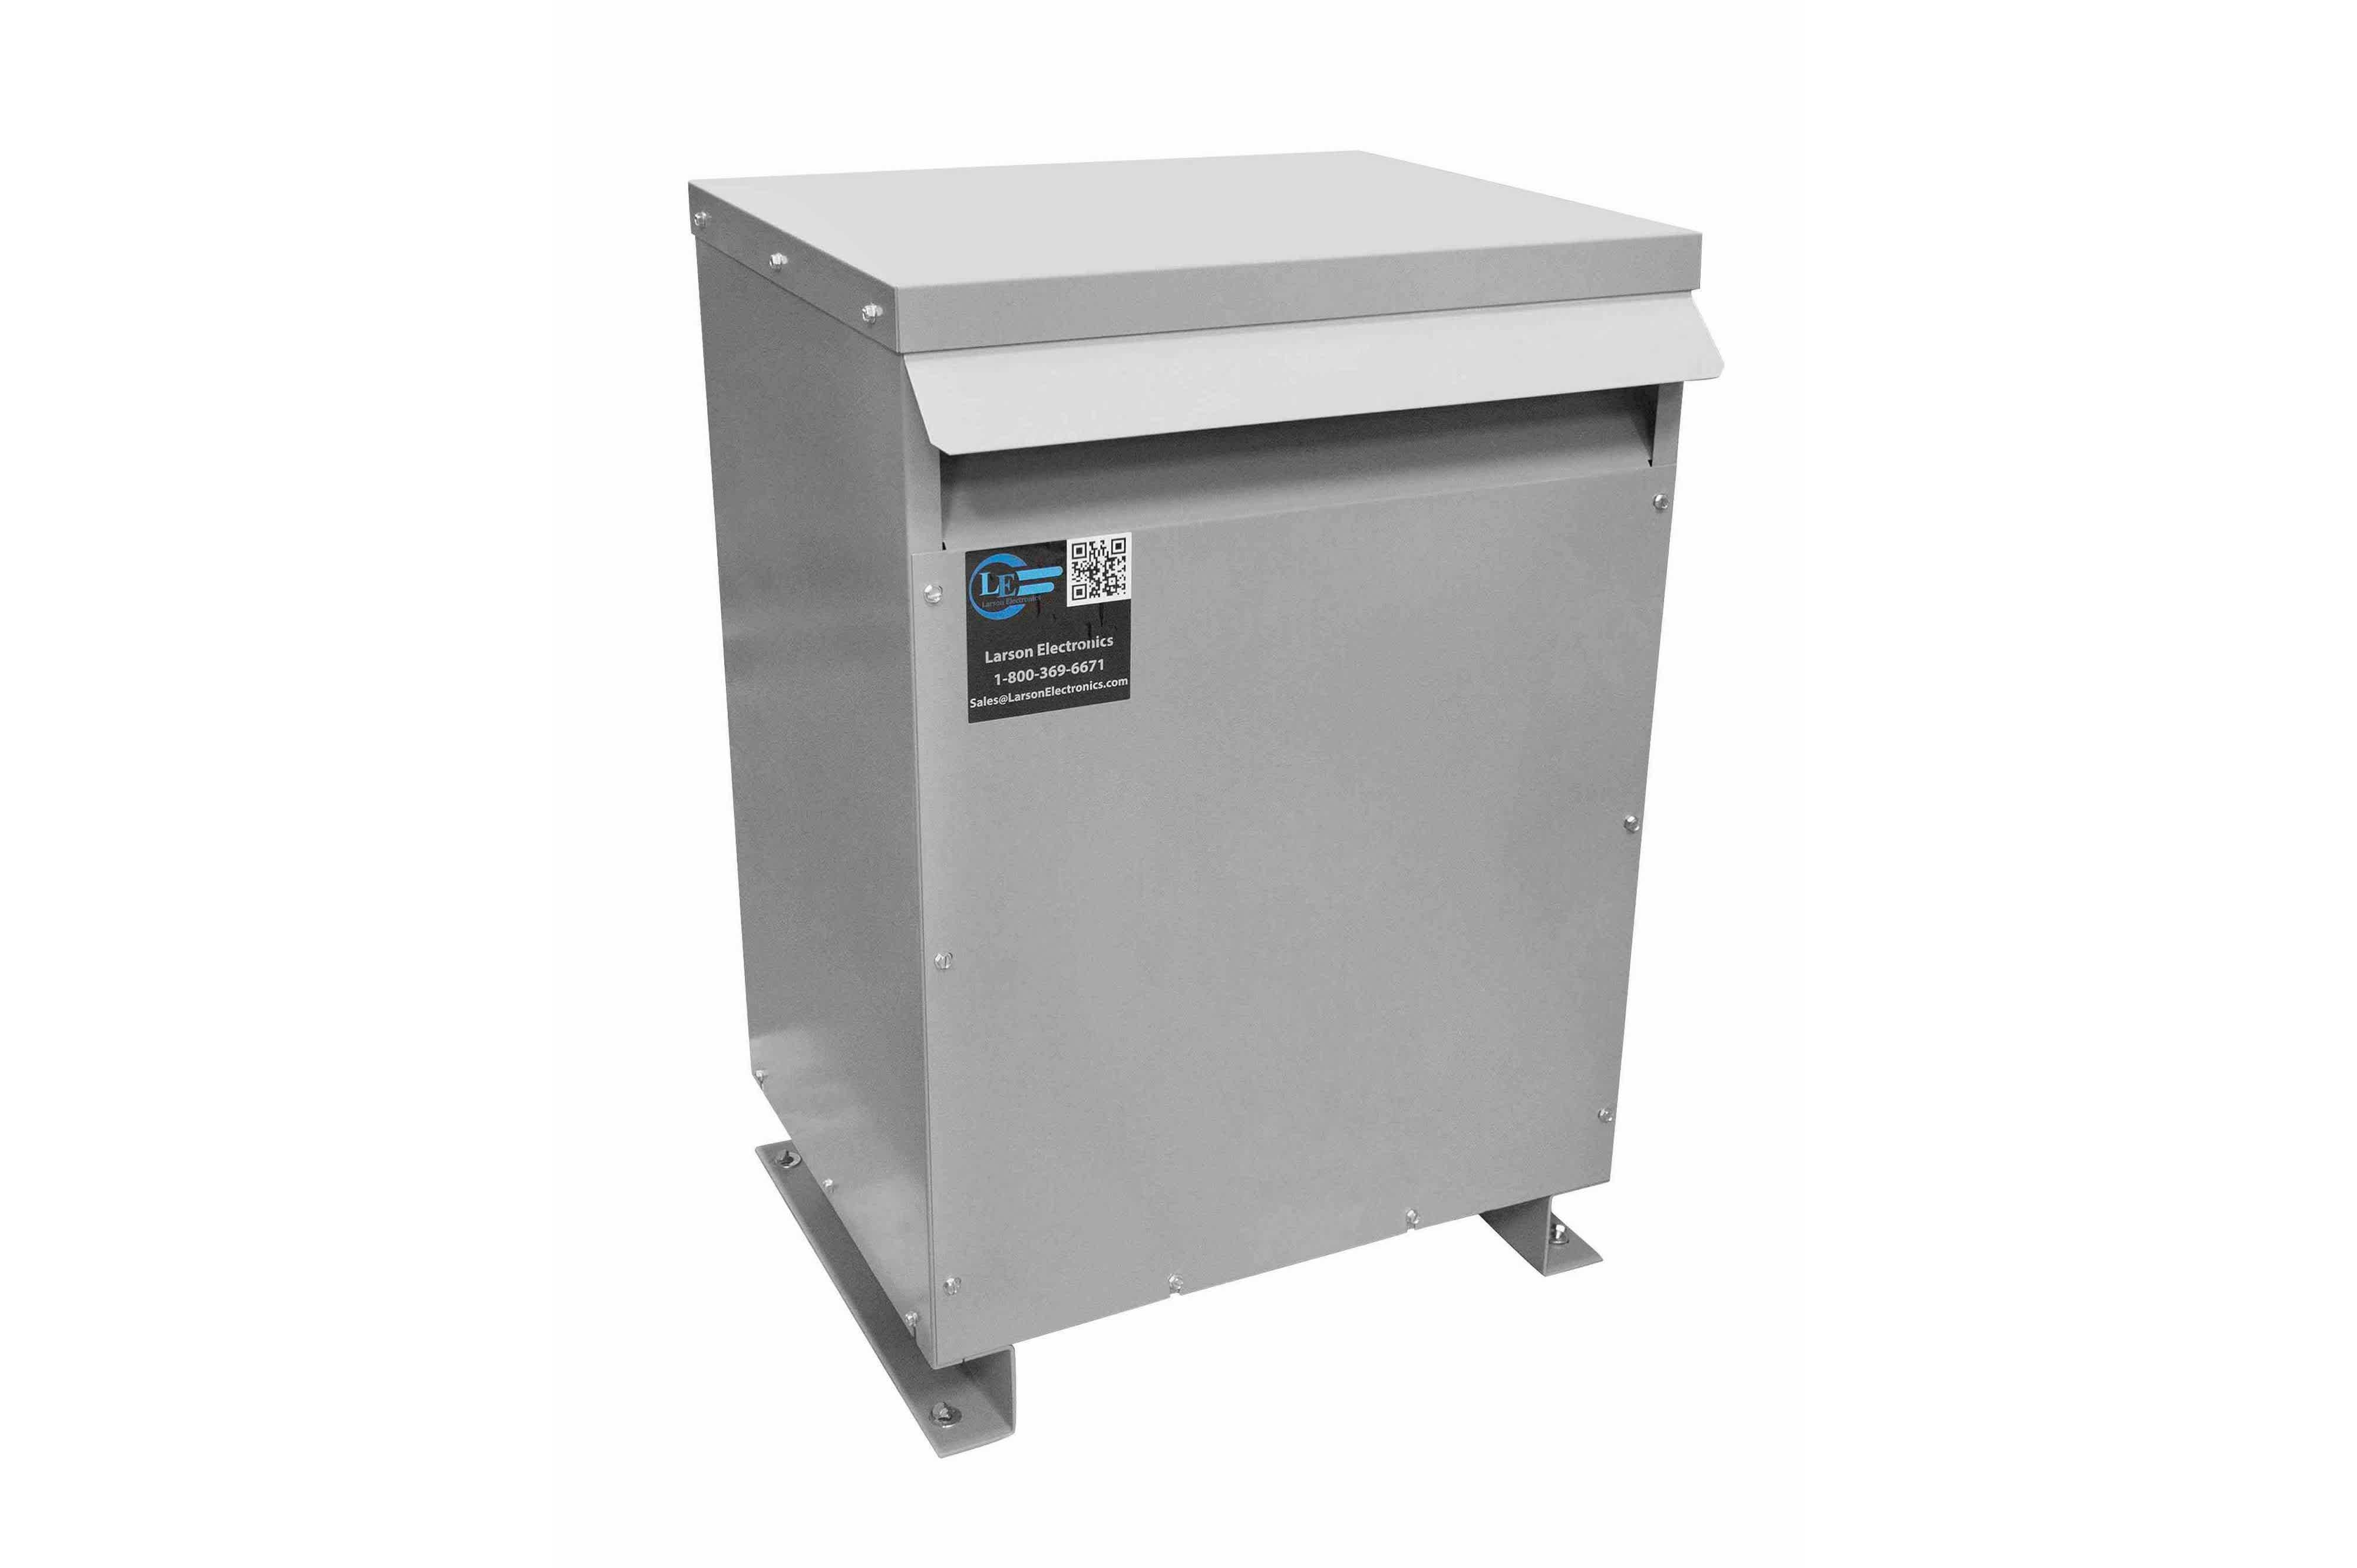 12 kVA 3PH Isolation Transformer, 460V Wye Primary, 208V Delta Secondary, N3R, Ventilated, 60 Hz